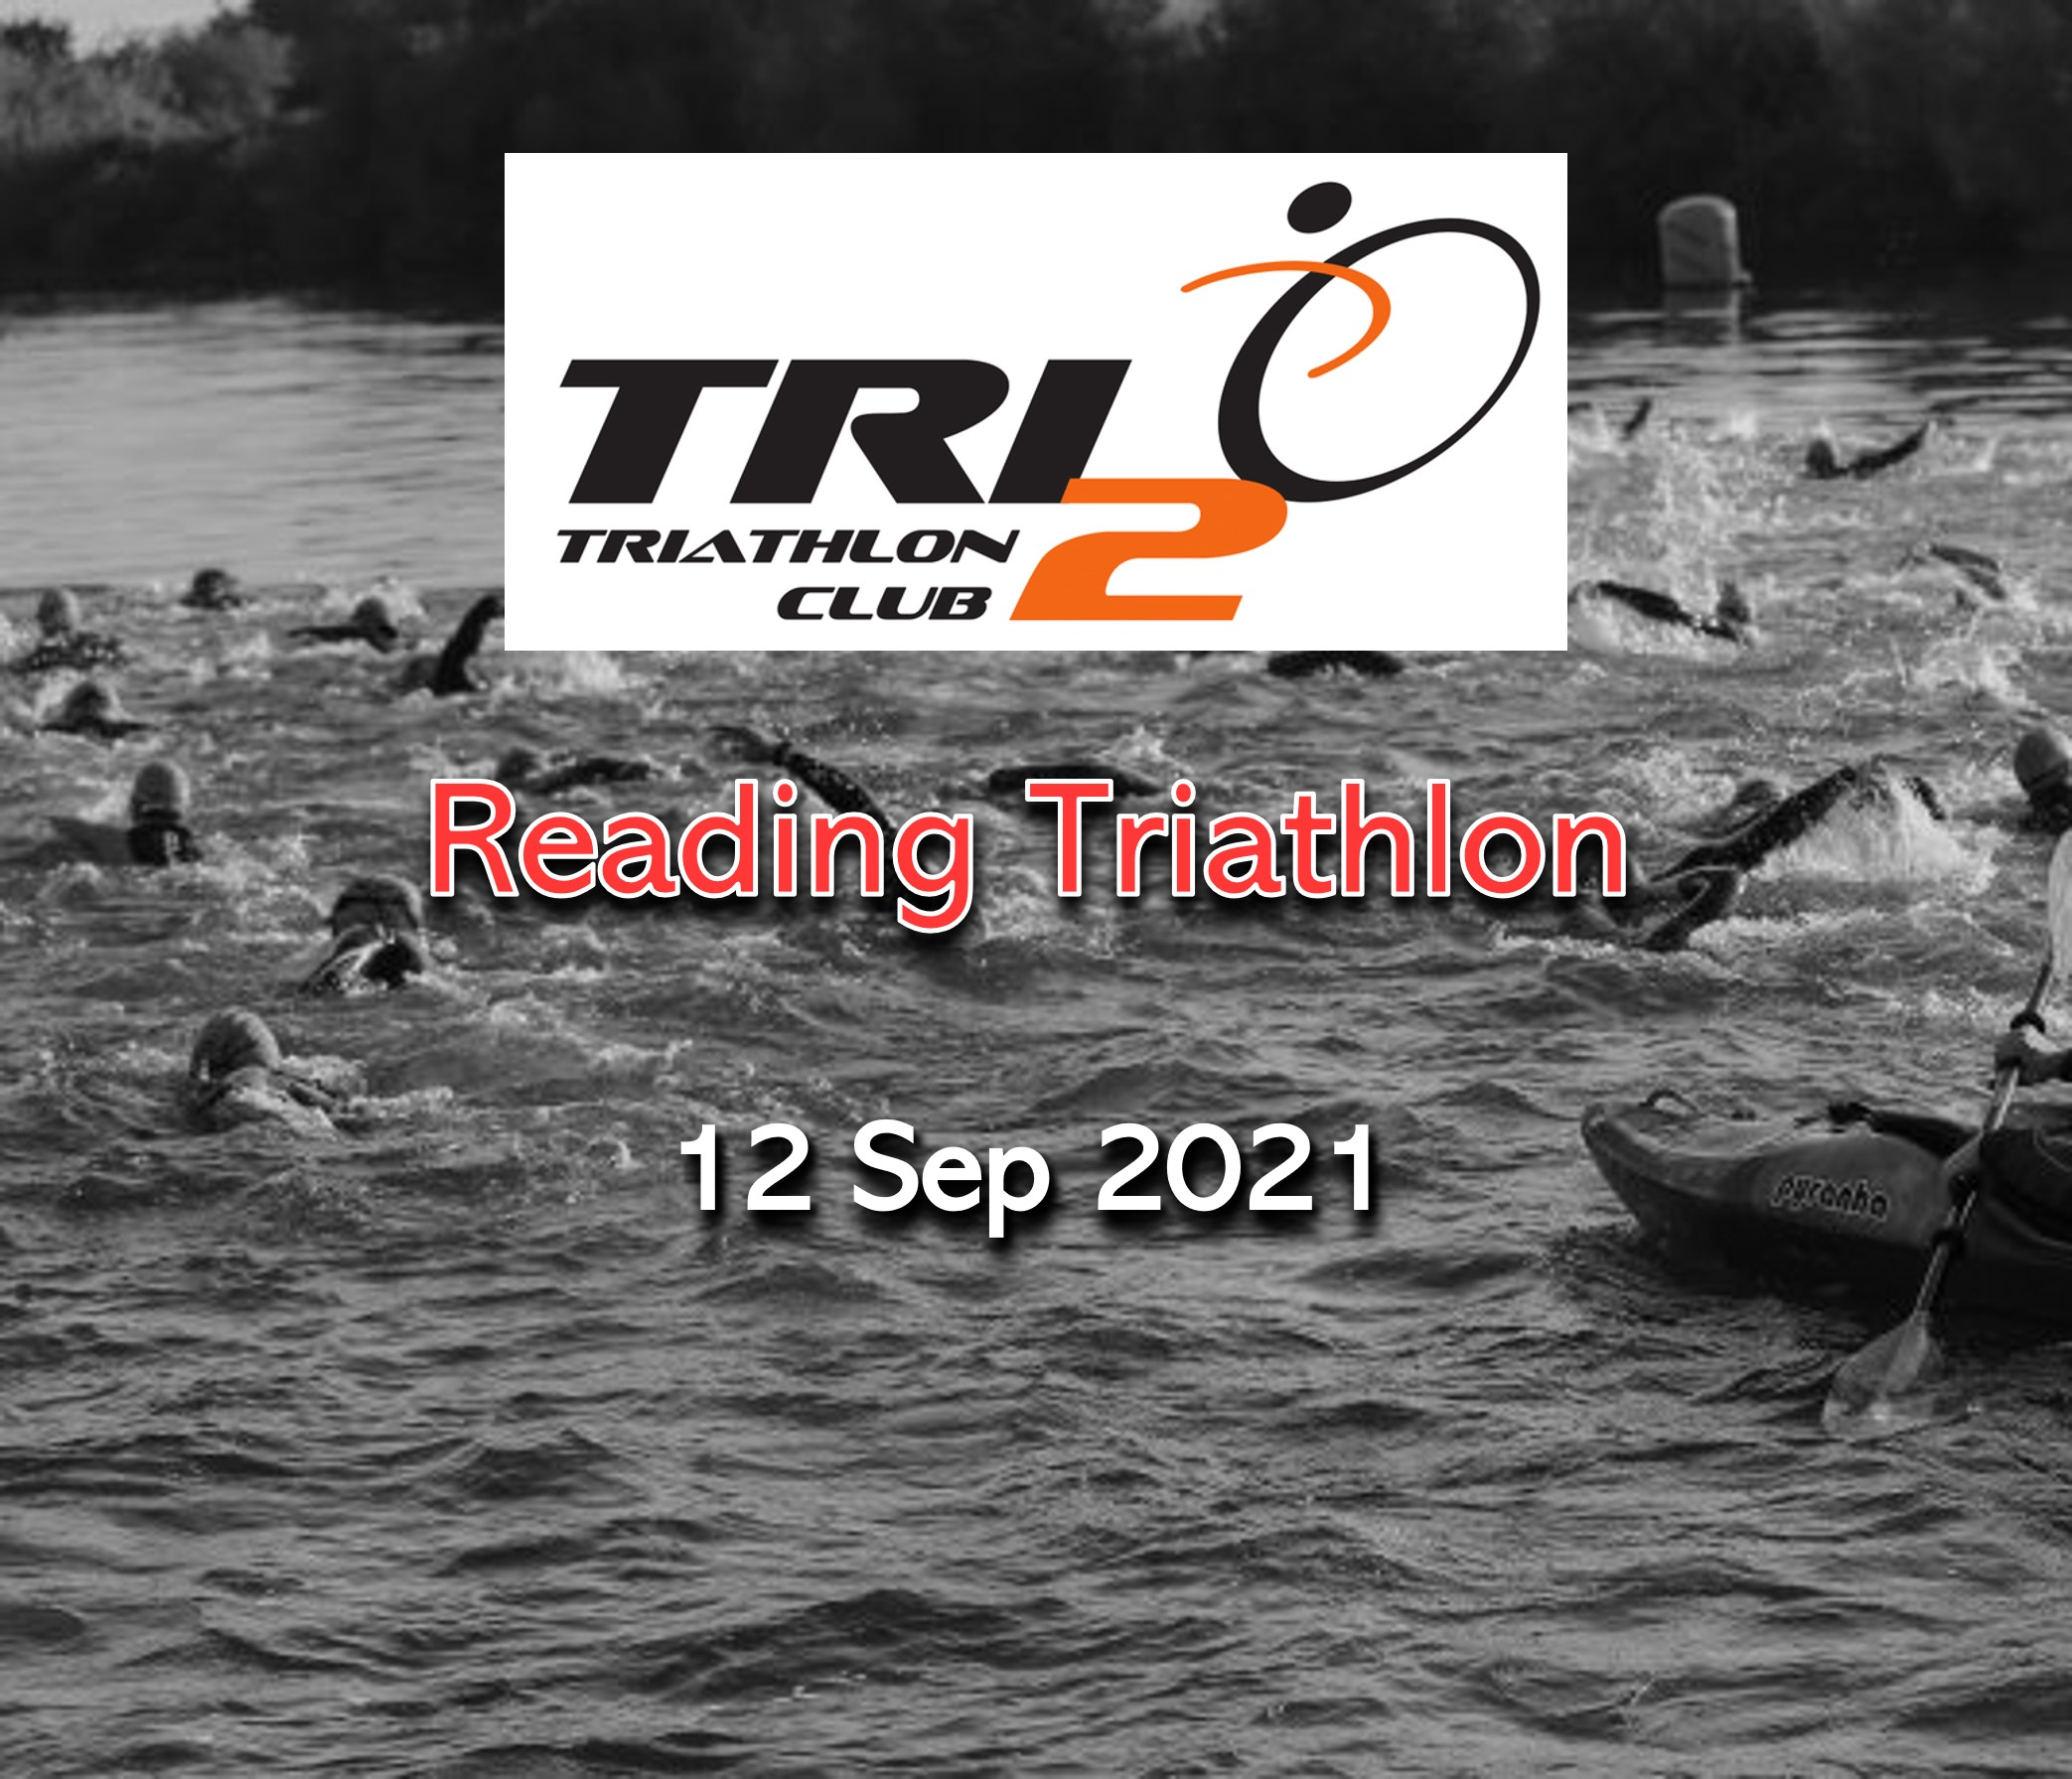 Reading Triathlon